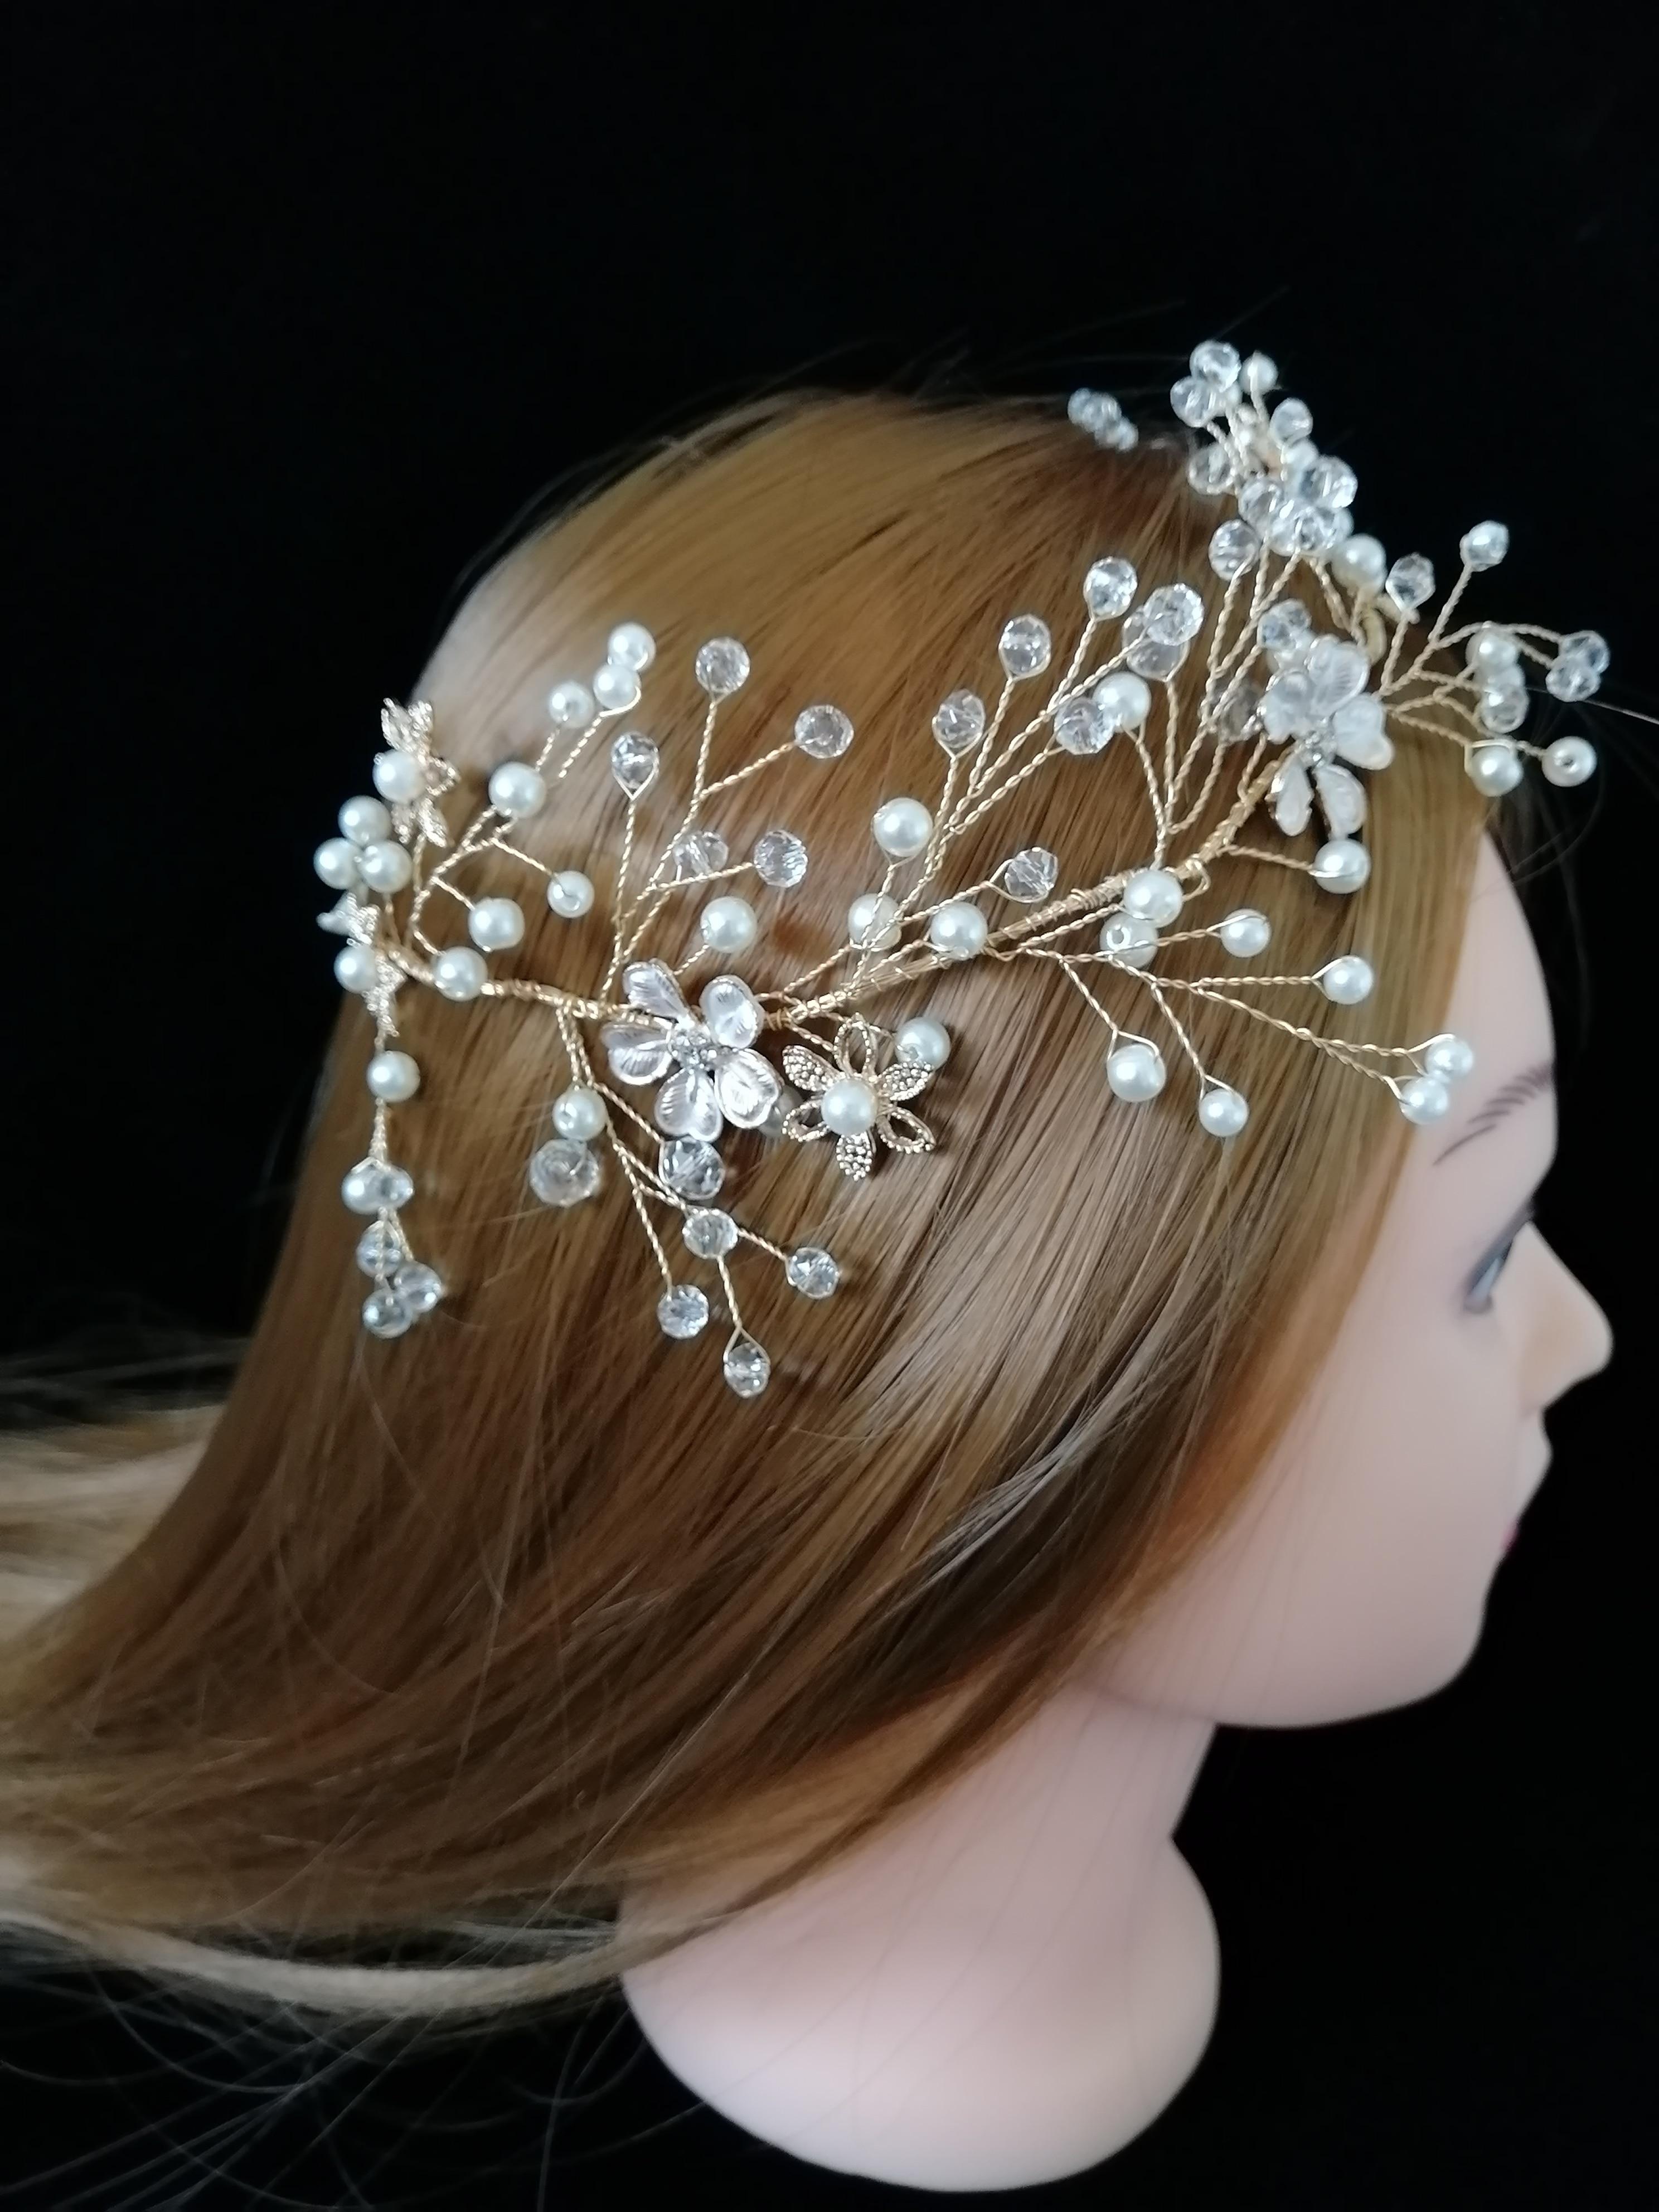 Gold Metal Korean Luxury Wedding Tiaras,Superior Beads Crystal Bridal Comb  Headbands Wreath Bridesmaid Headdress Accessories